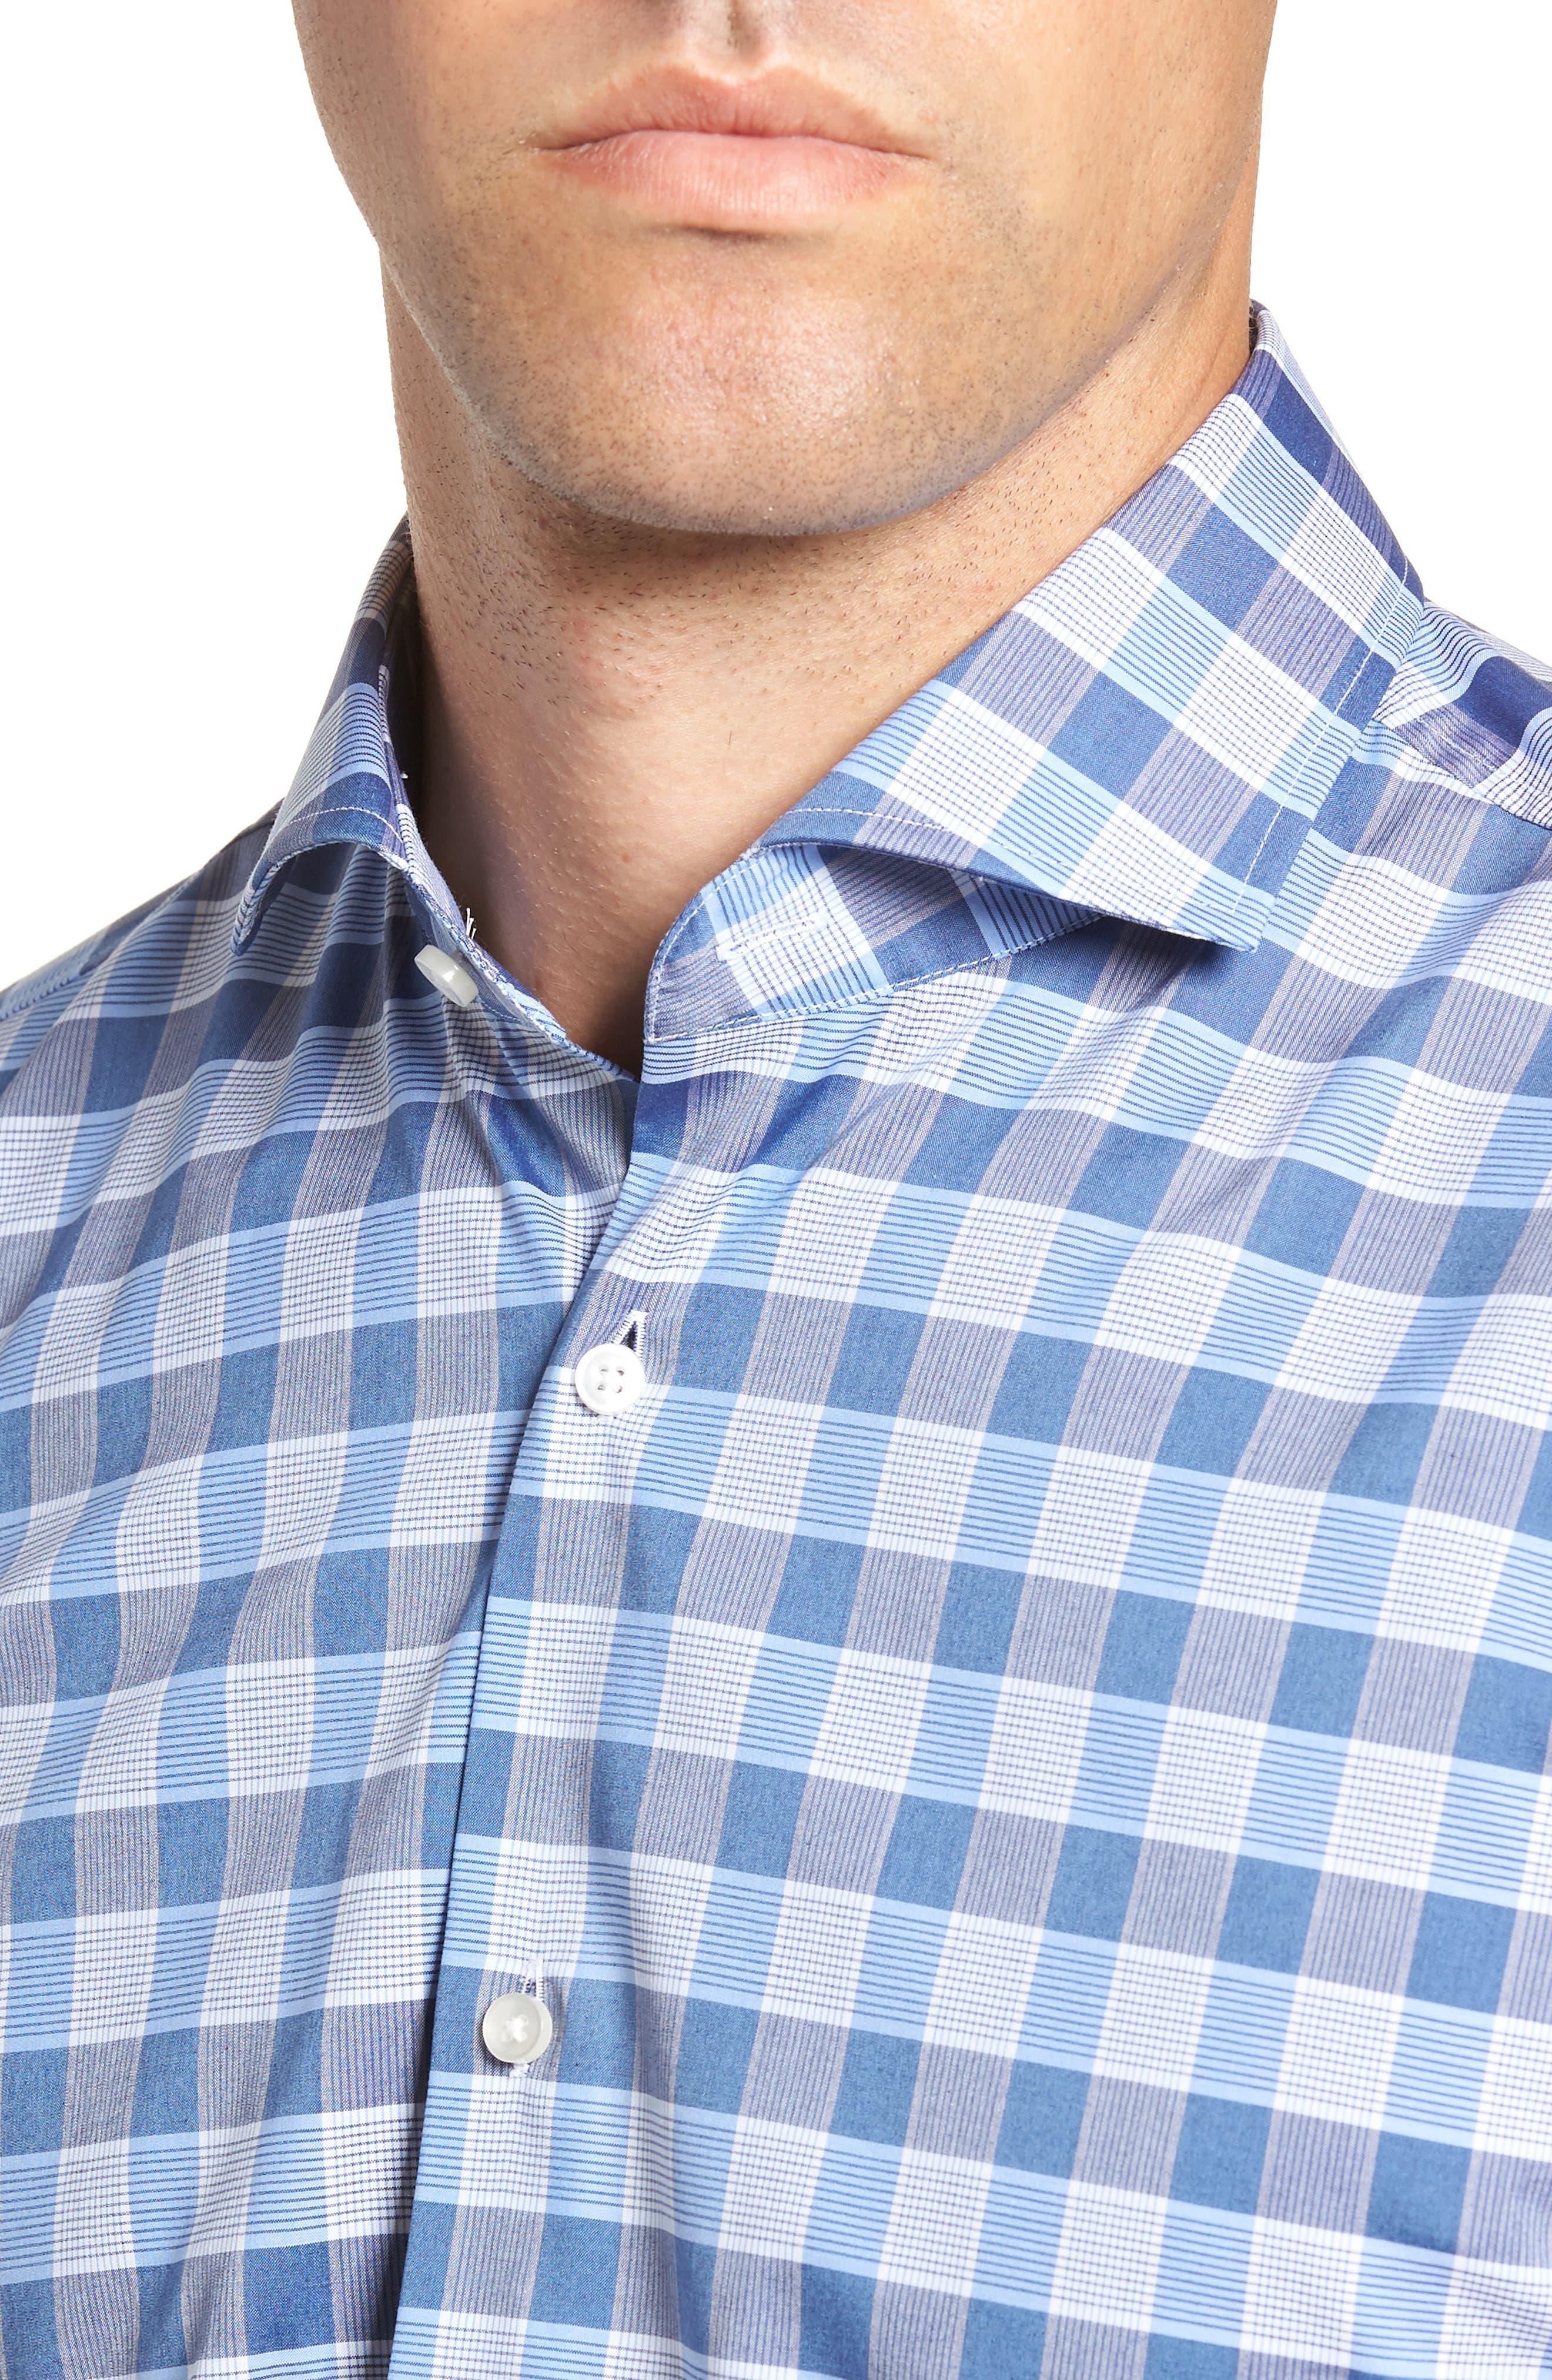 Jason Slim Fit Plaid Dress Shirt,                             Alternate thumbnail 2, color,                             BLUE